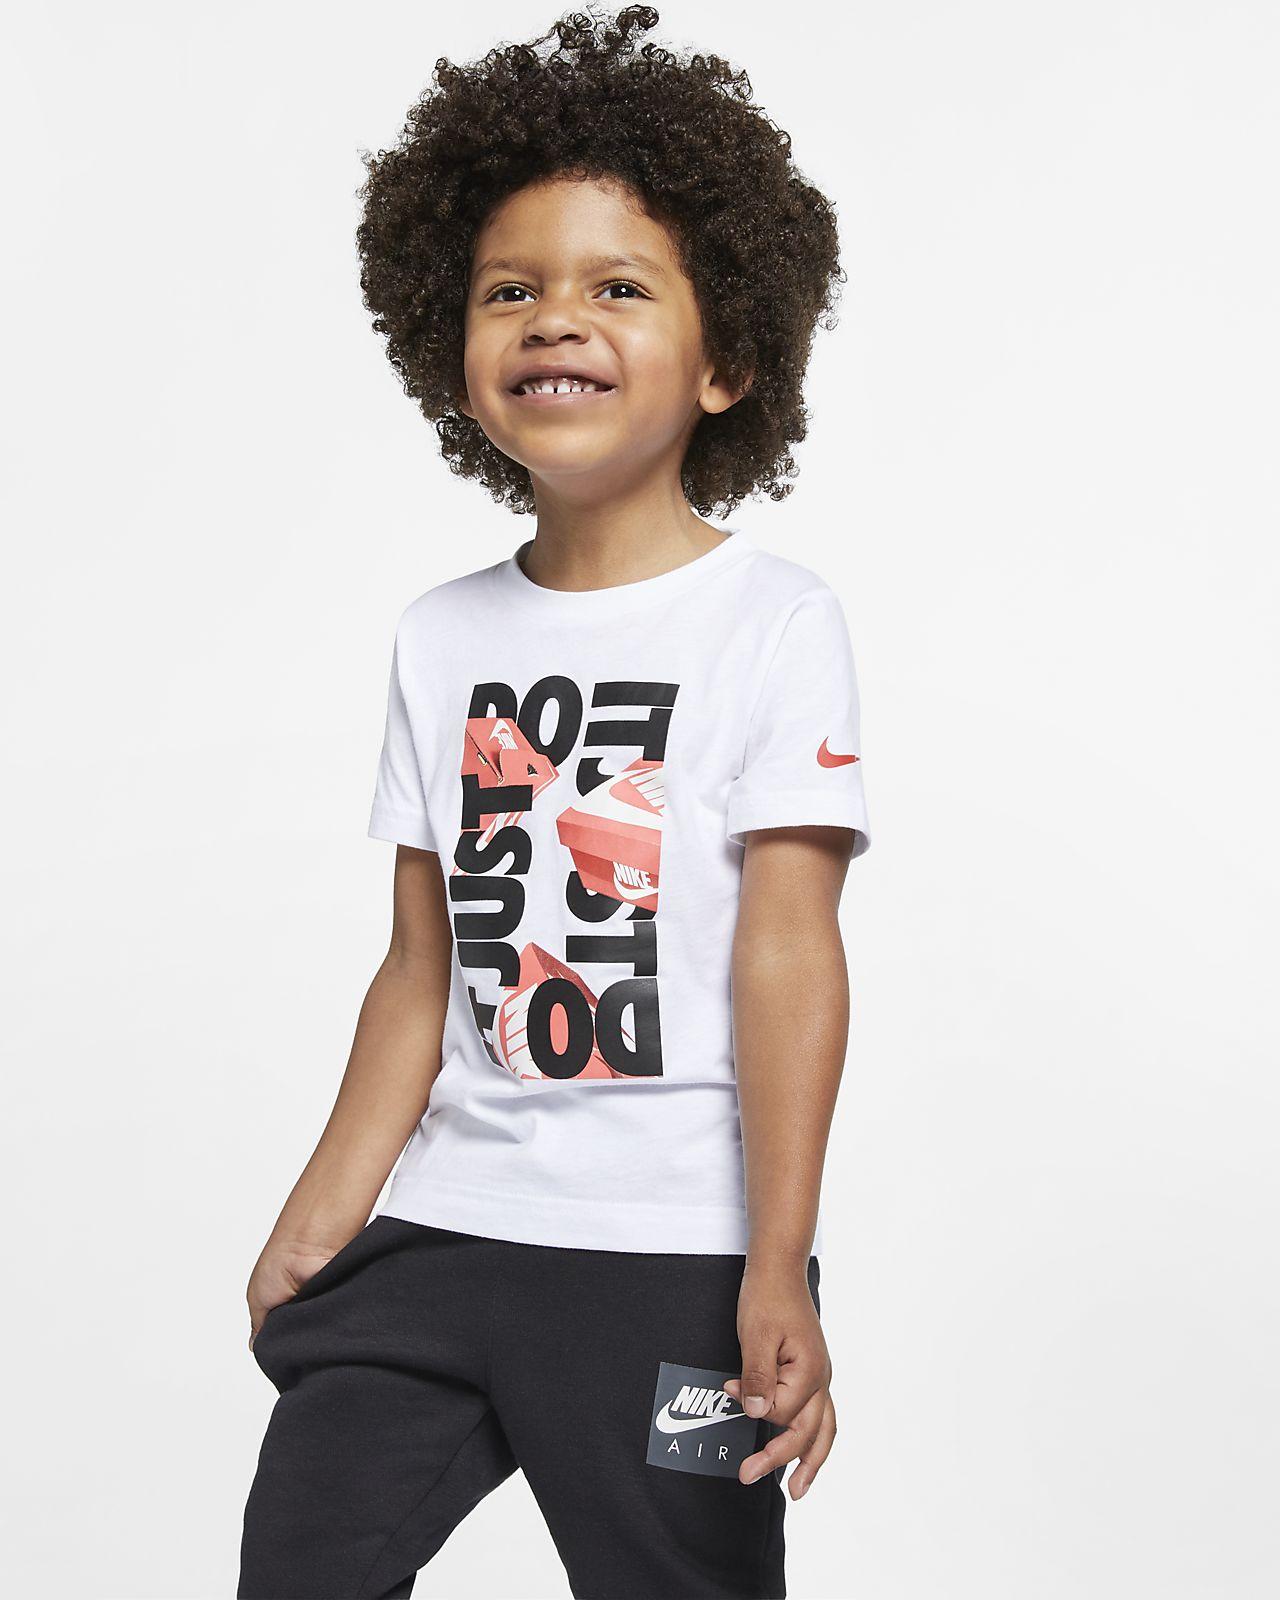 Nike-T-shirt til småbørn